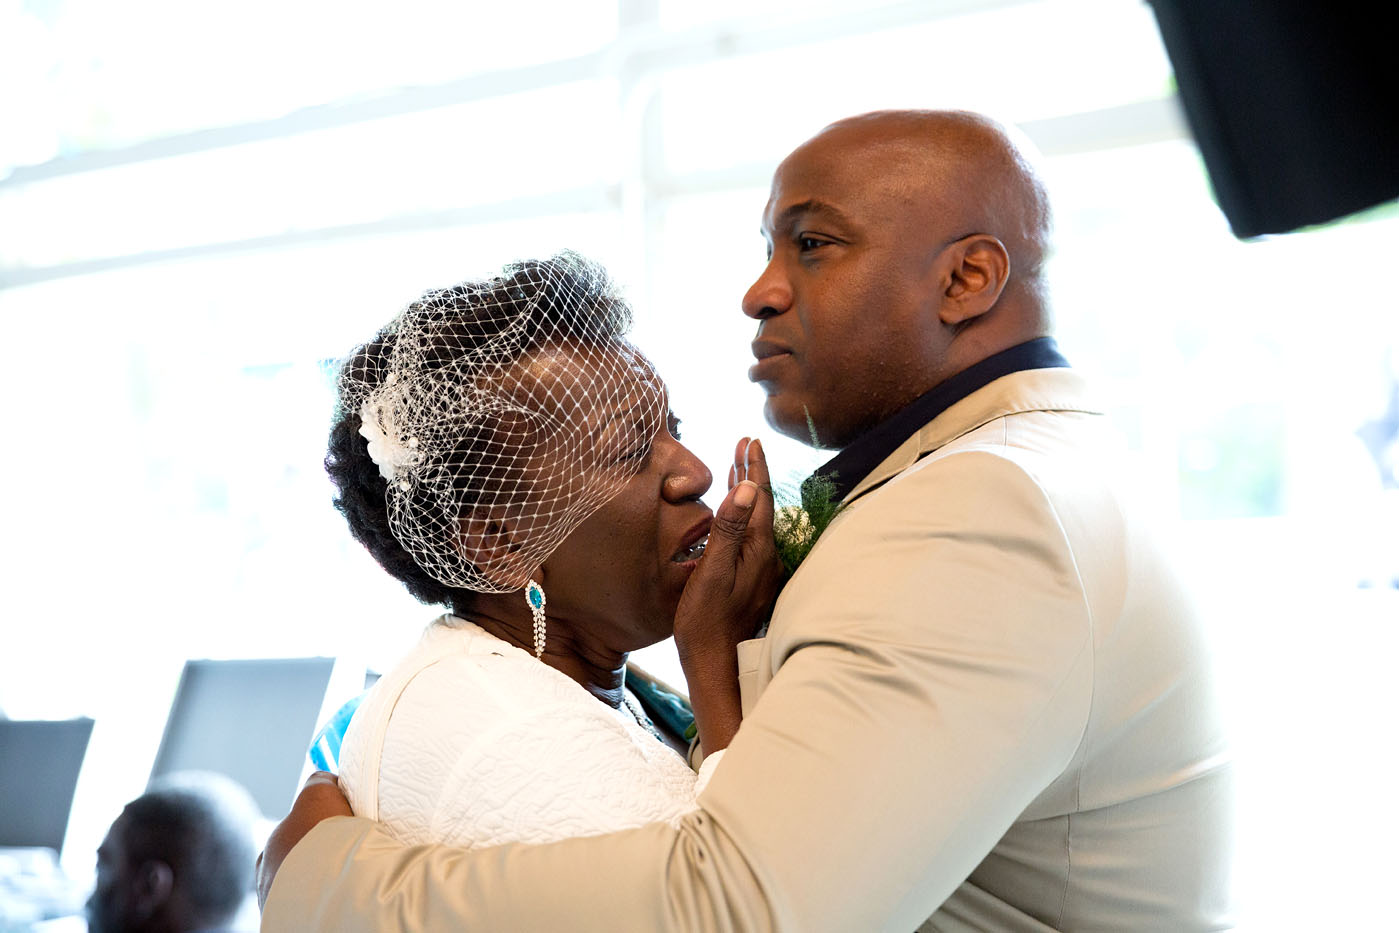 bruiloft-wedding-trouwen-rotterdam-fotograaf-bobhersbach-geluk